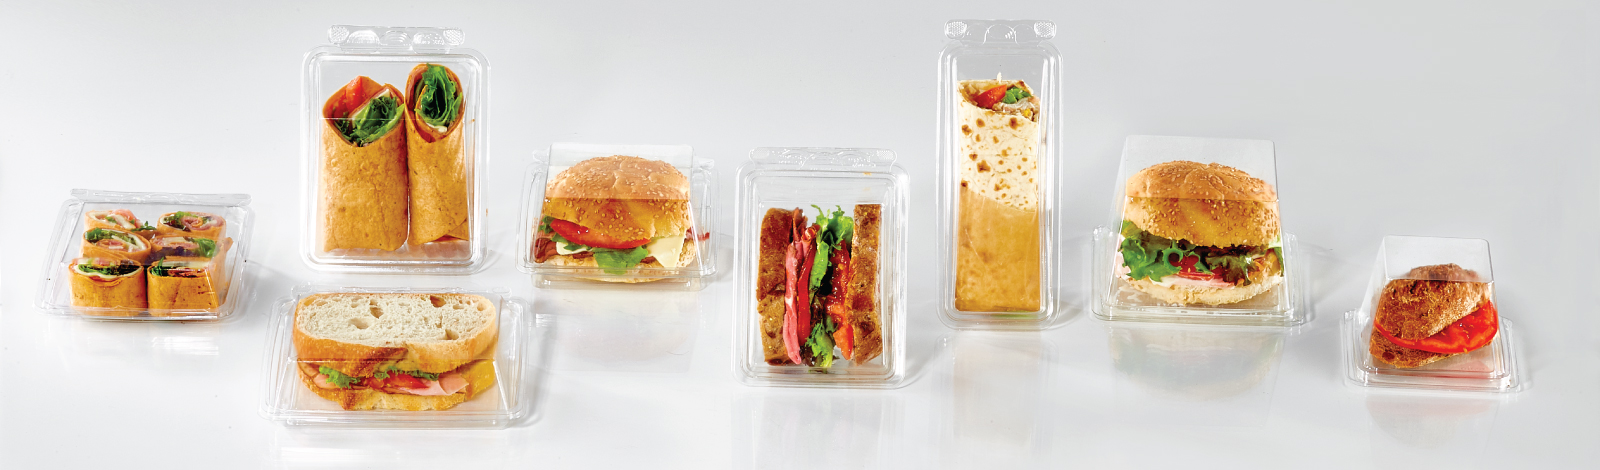 sandwich-kit-lp-banner